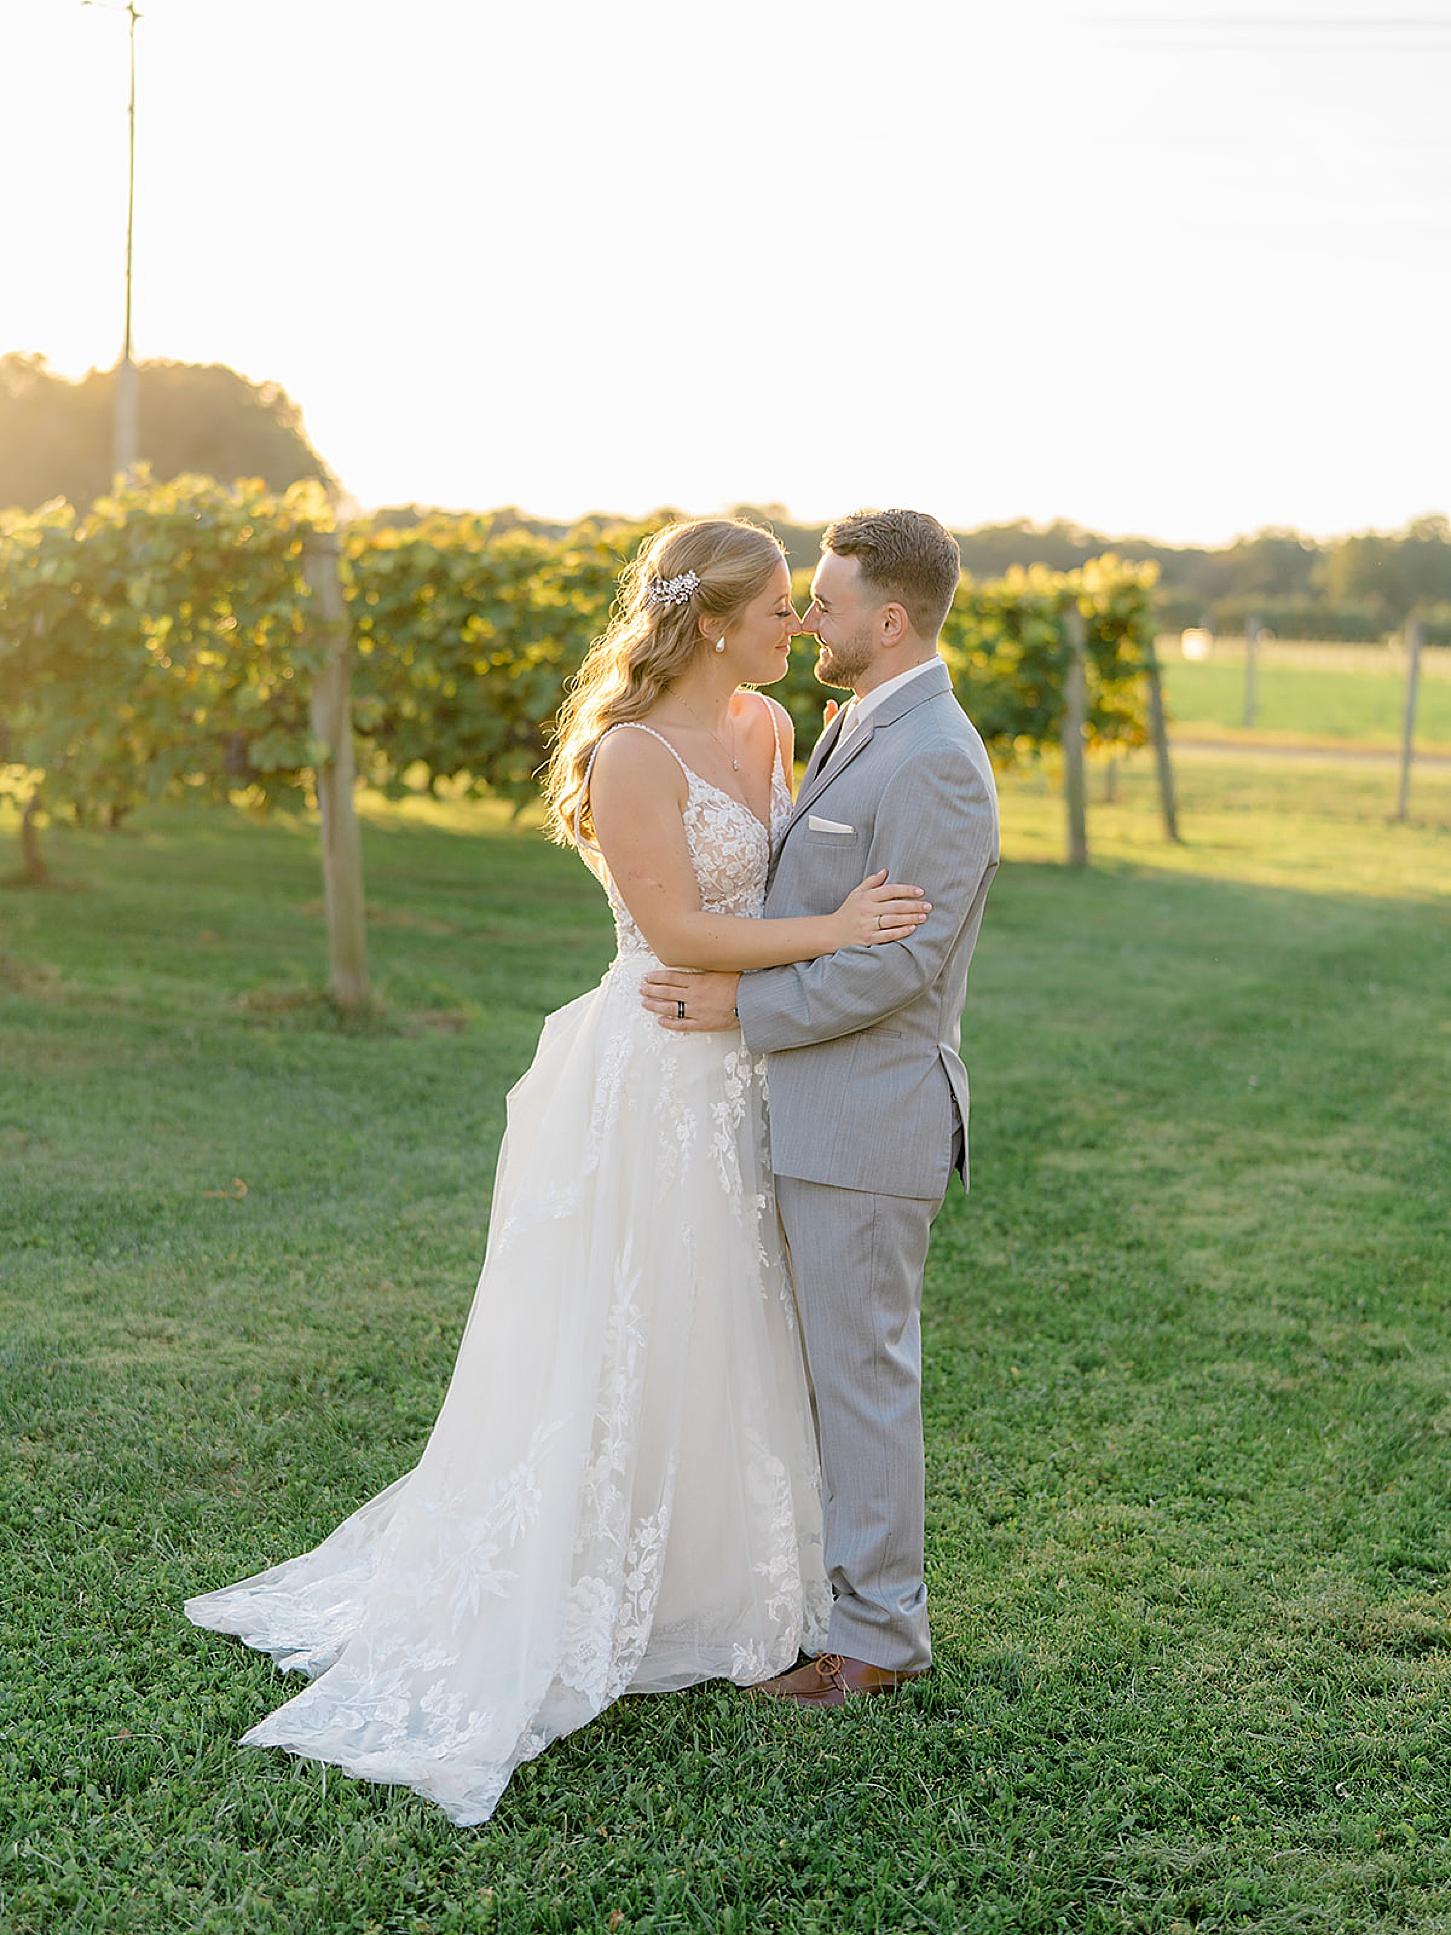 Valenzano Winery Vitners Pavillion Wedding Photography by Magdalena Studios 0032